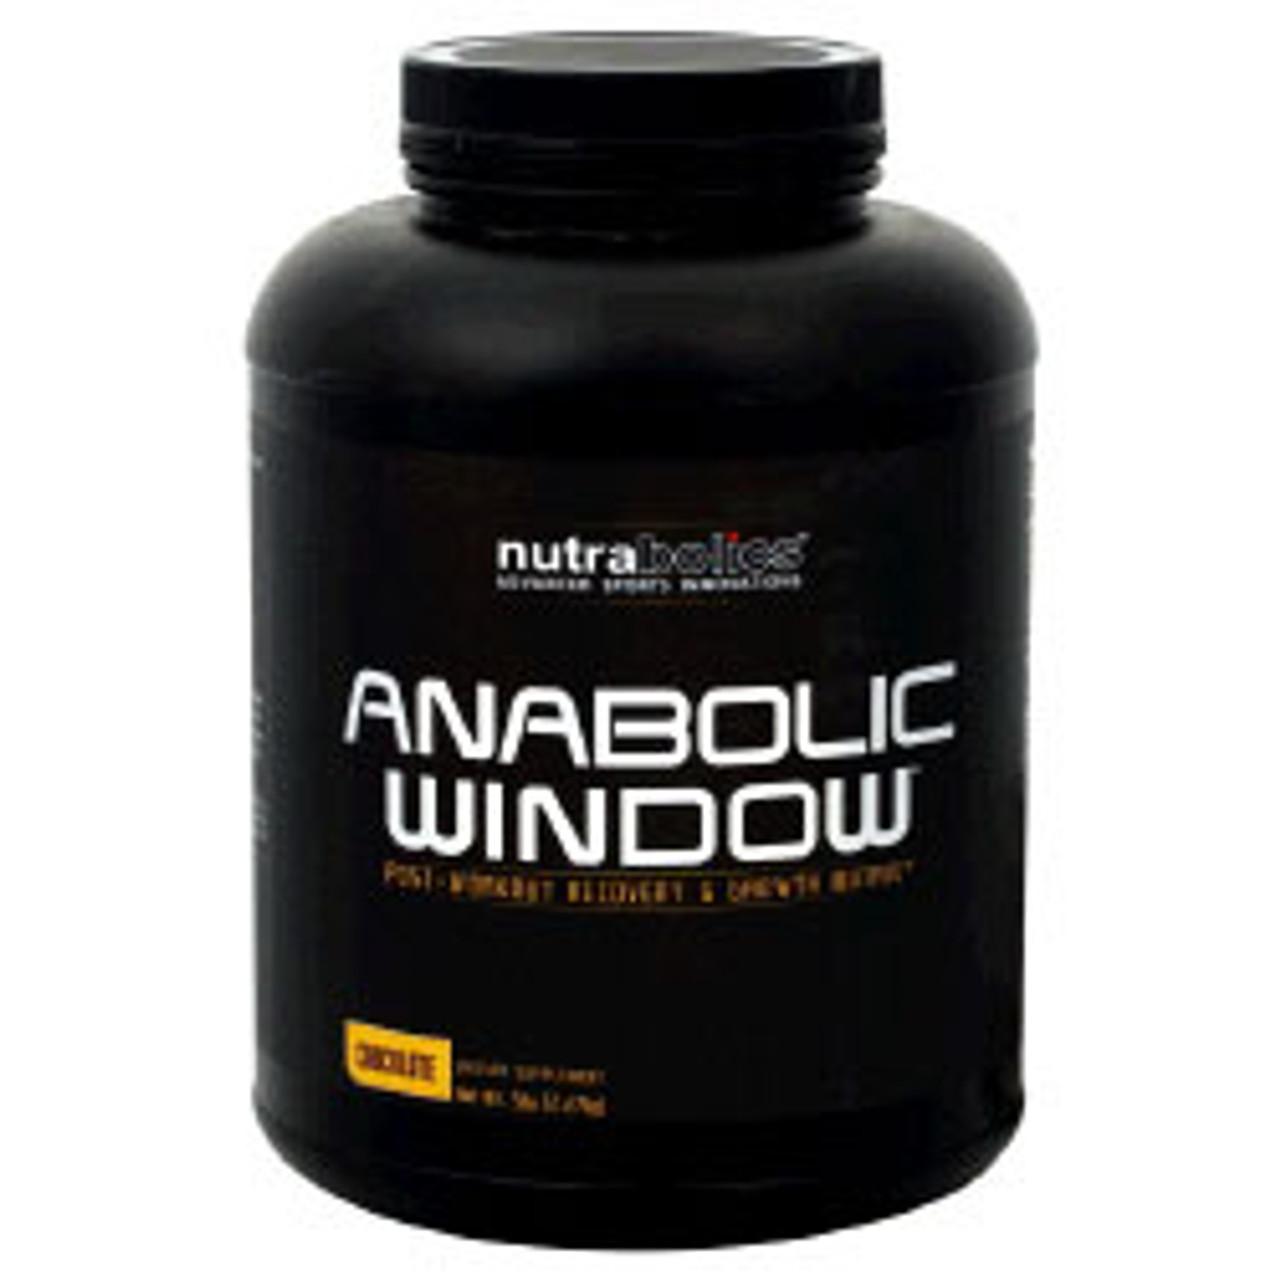 Anabolic Window 5lb Nutrabolics